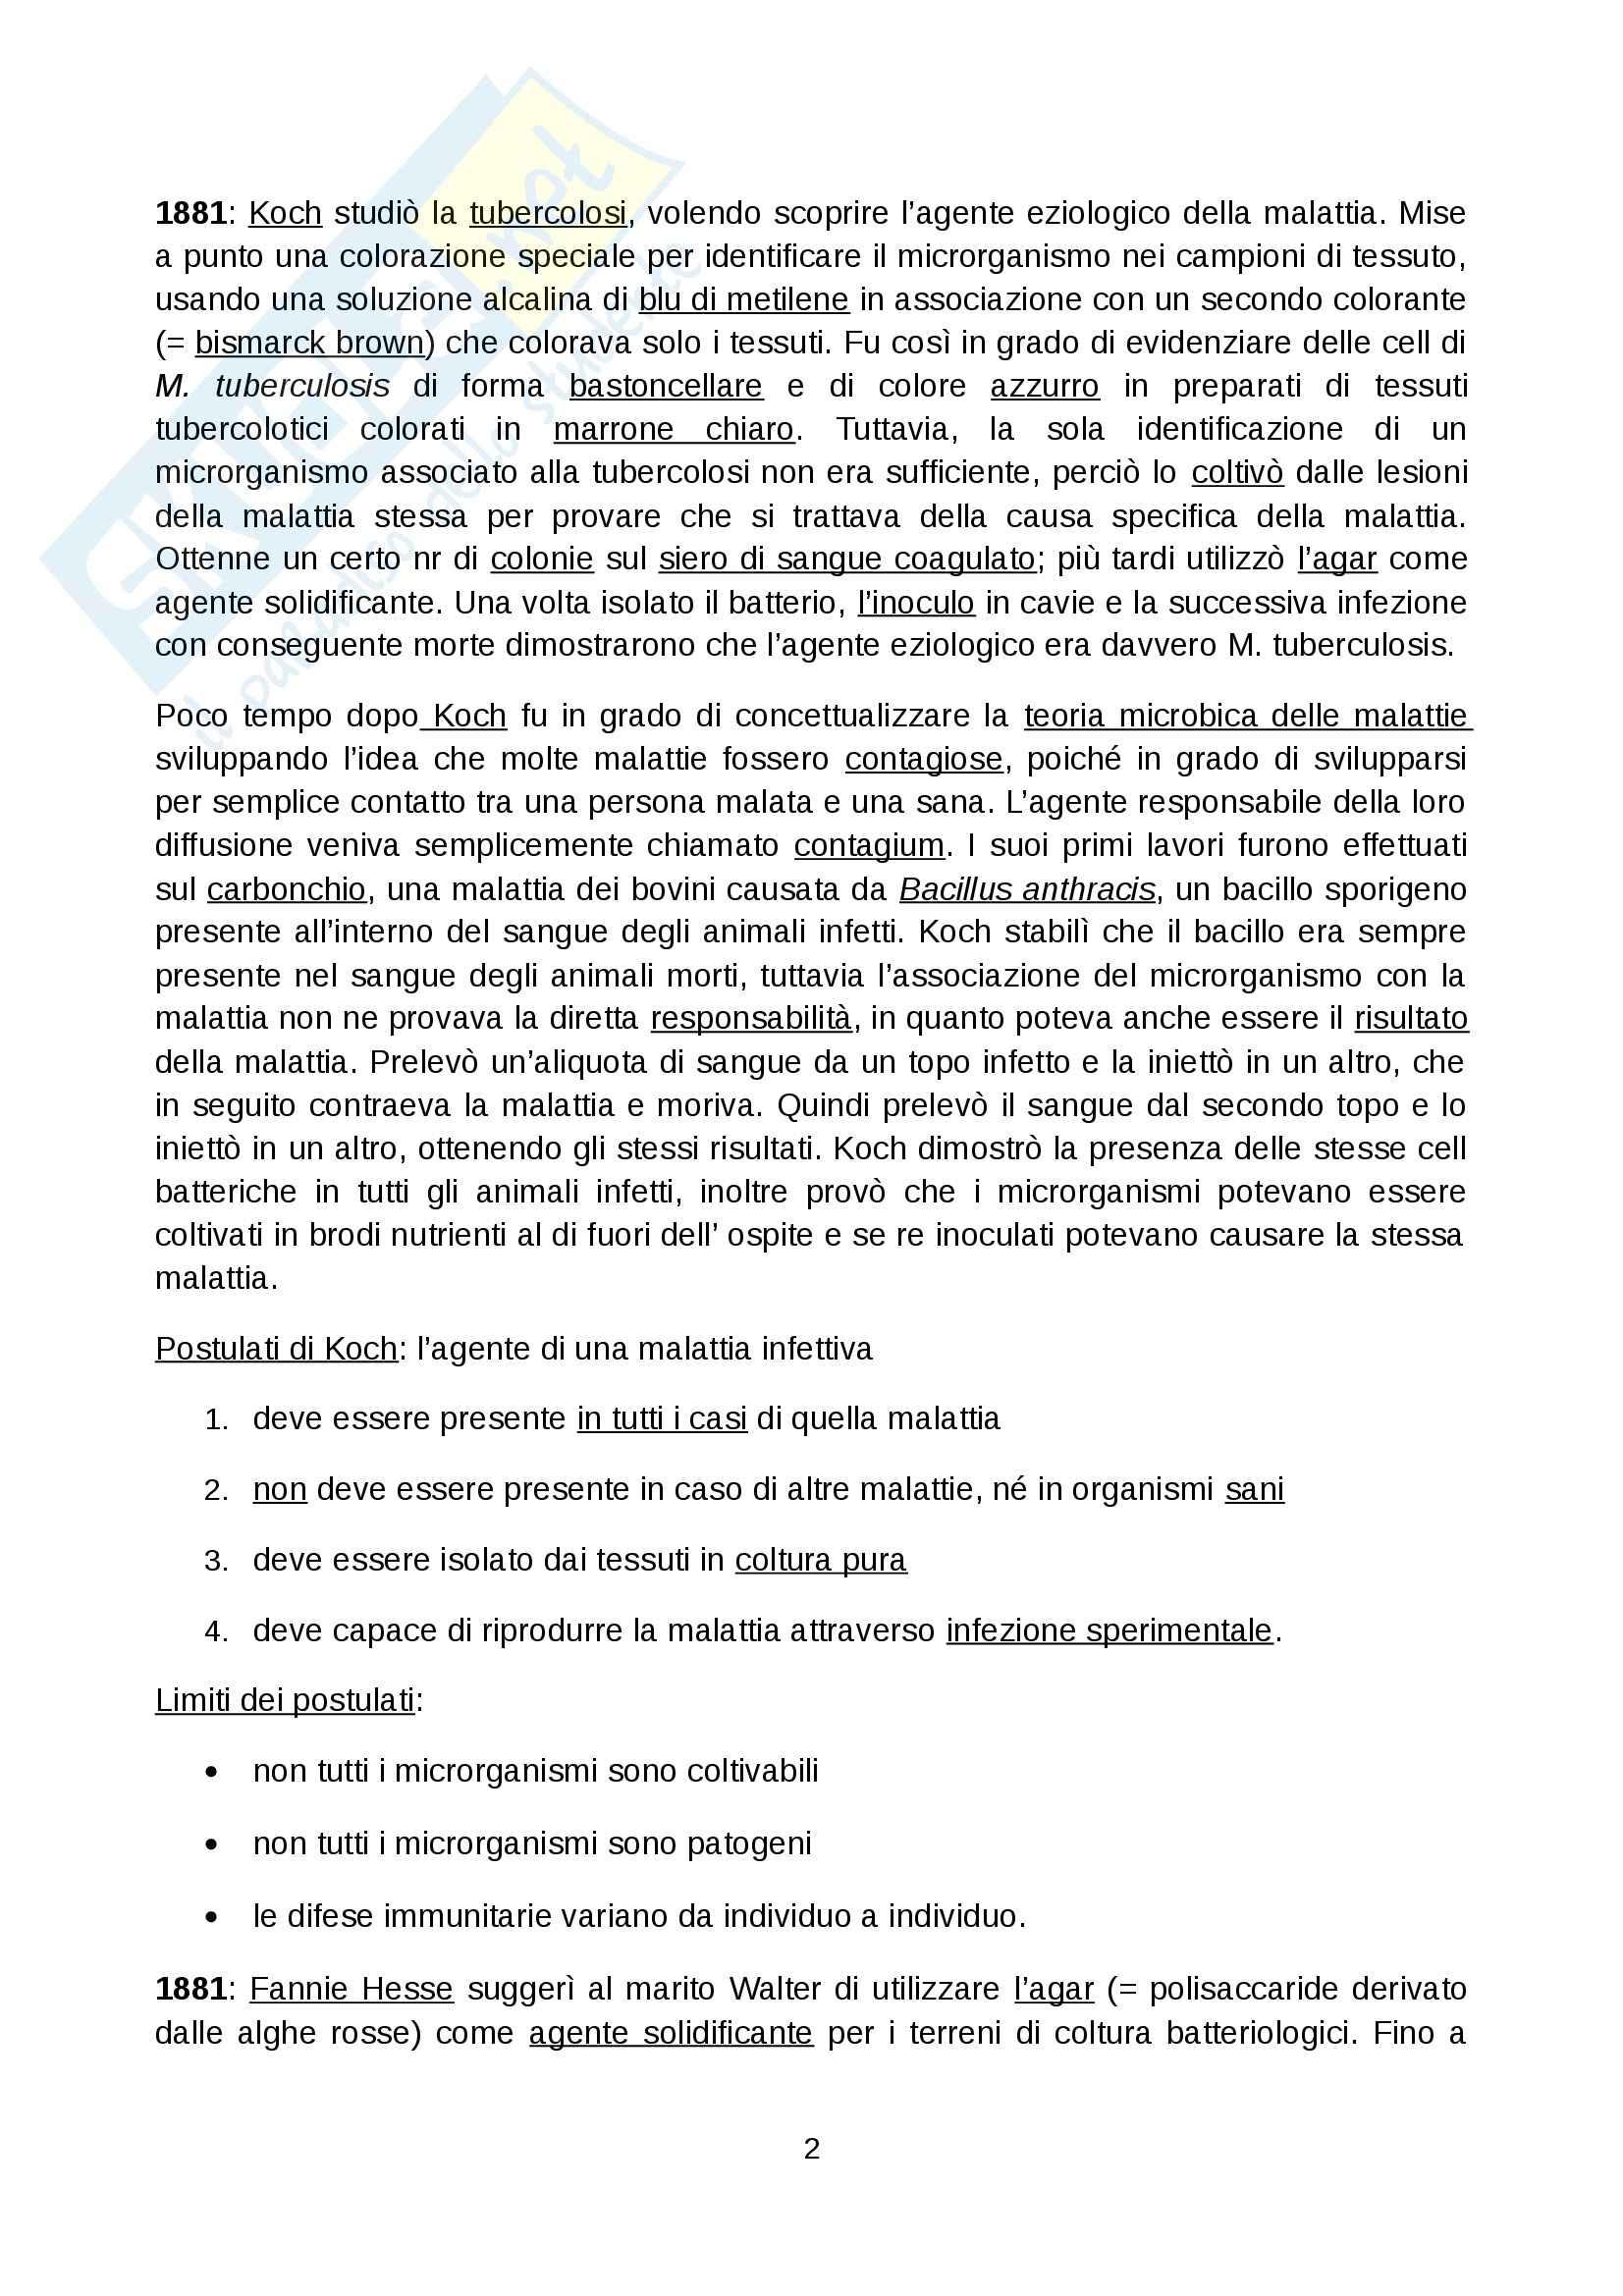 Microbiologia generale - Appunti Pag. 2